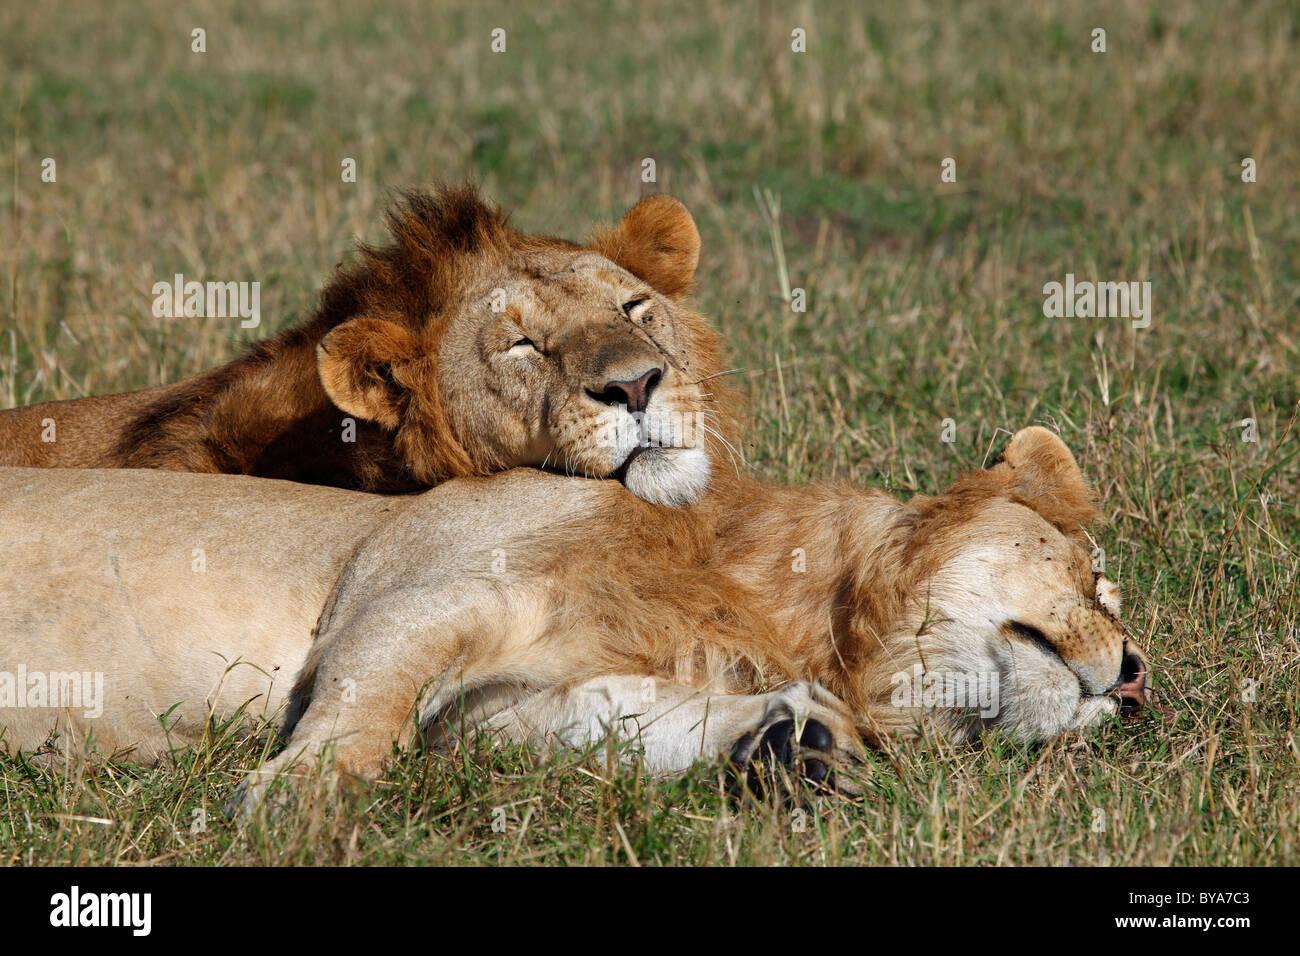 Two sleeping lions (Panthera leo), male, Masai Mara, Kenya, Africa - Stock Image